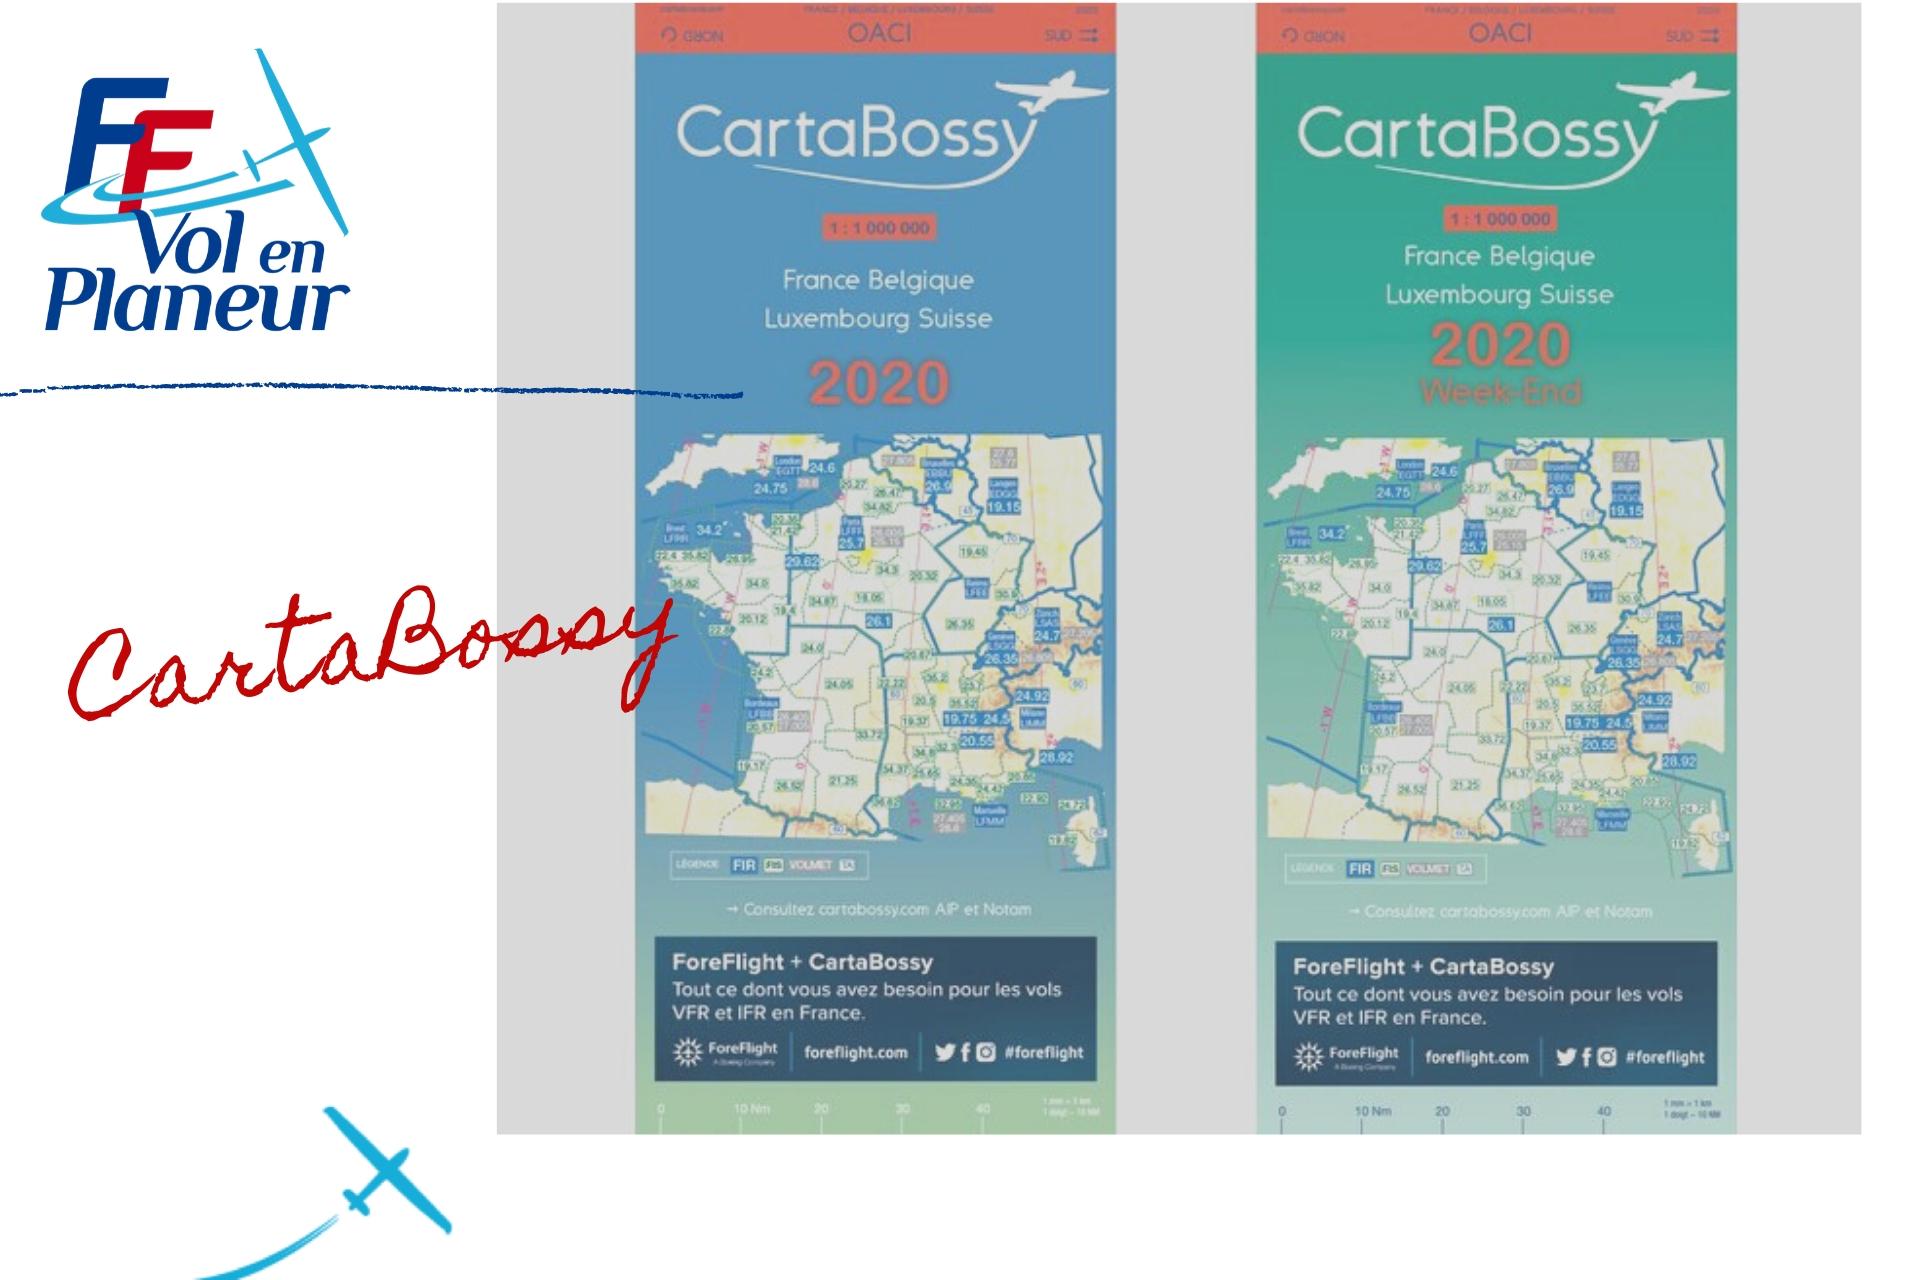 CartaBossy